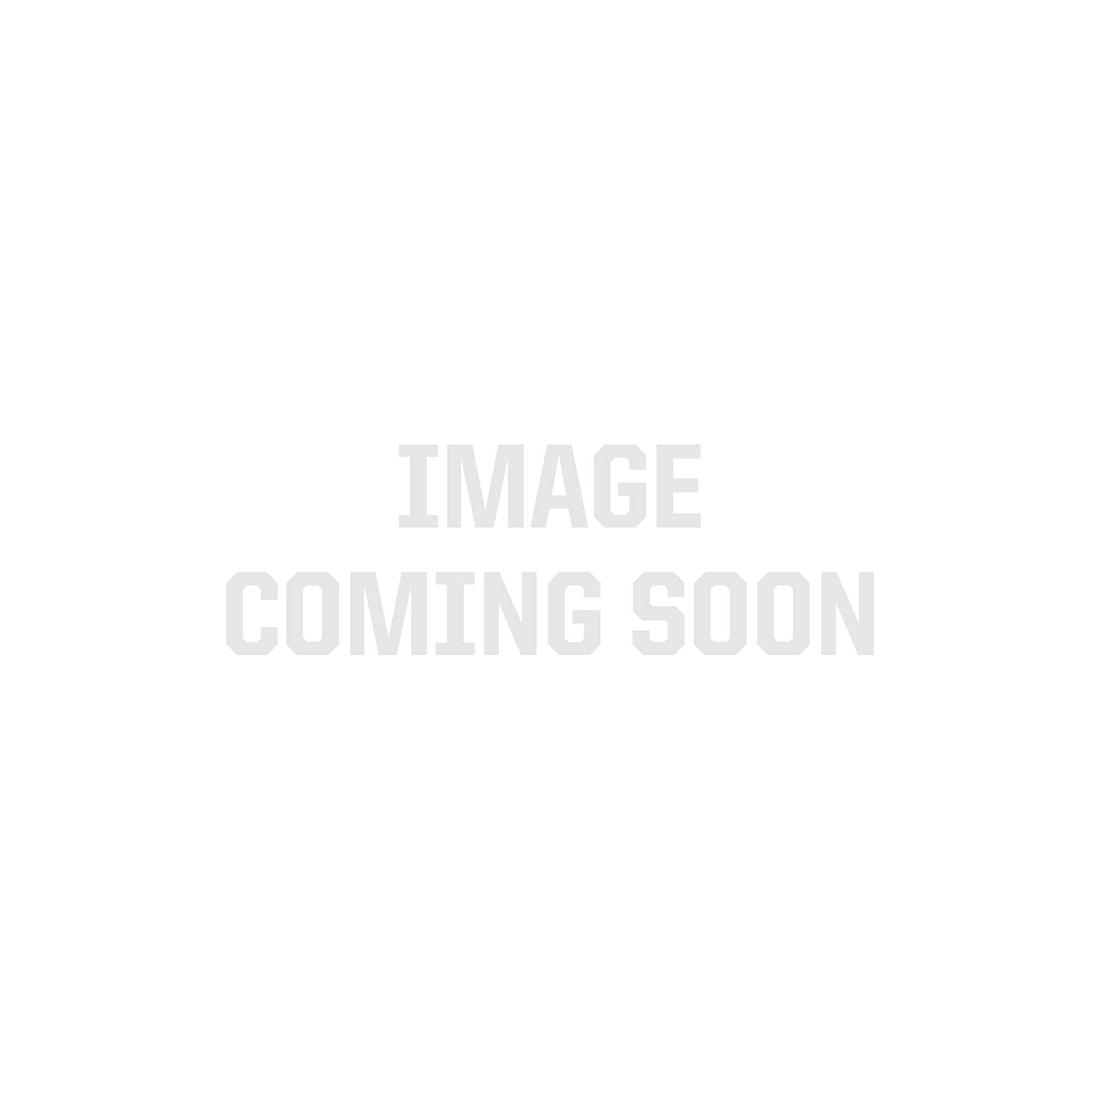 Lutron CTCL-153P Skylark Contour Dimmable CFL/LED Dimmer; 150 Watt, Single Pole or 3-Way (Multi-location) Black